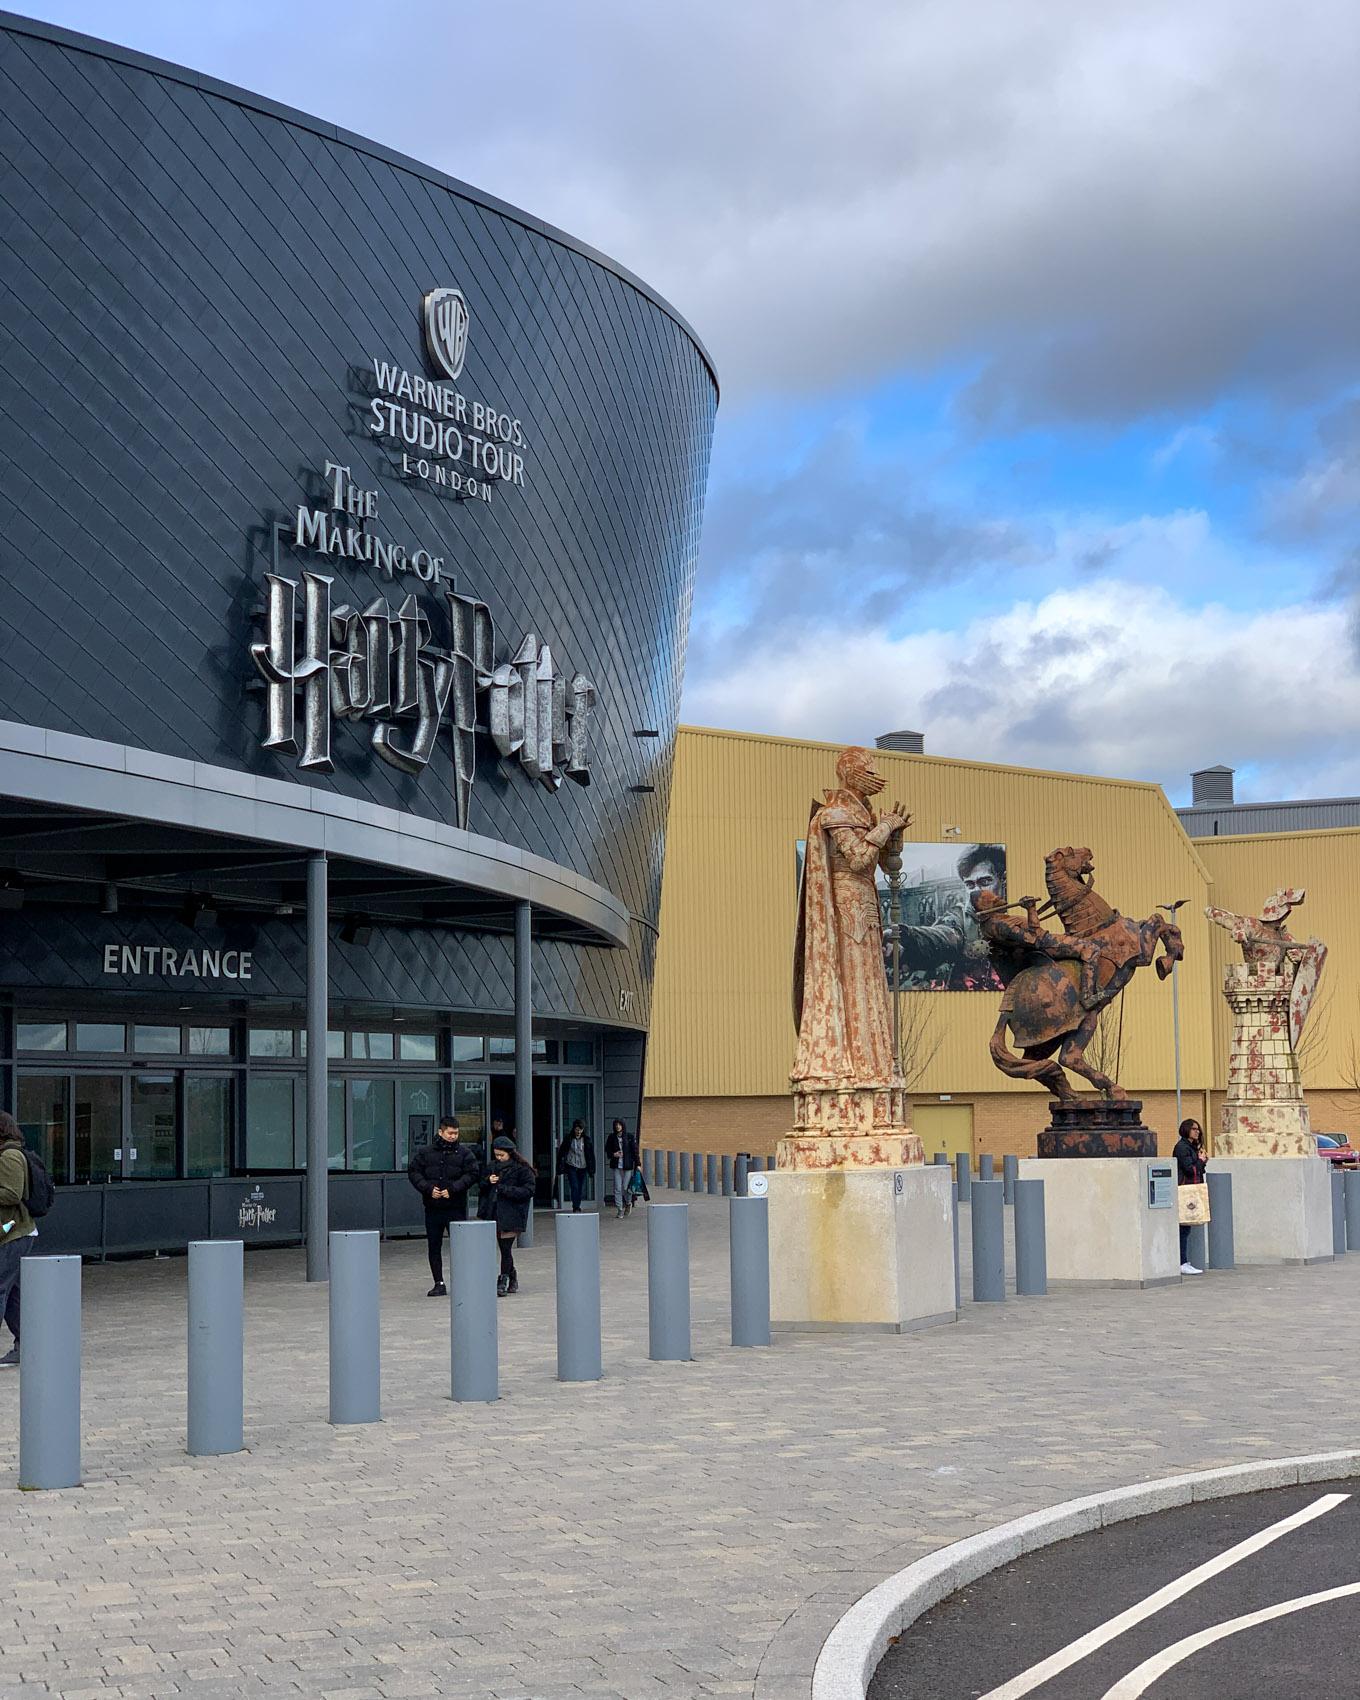 Harry Potter -fanin unelmien täyttymys: kierros Warner Brothersin studioilla Lontoossa